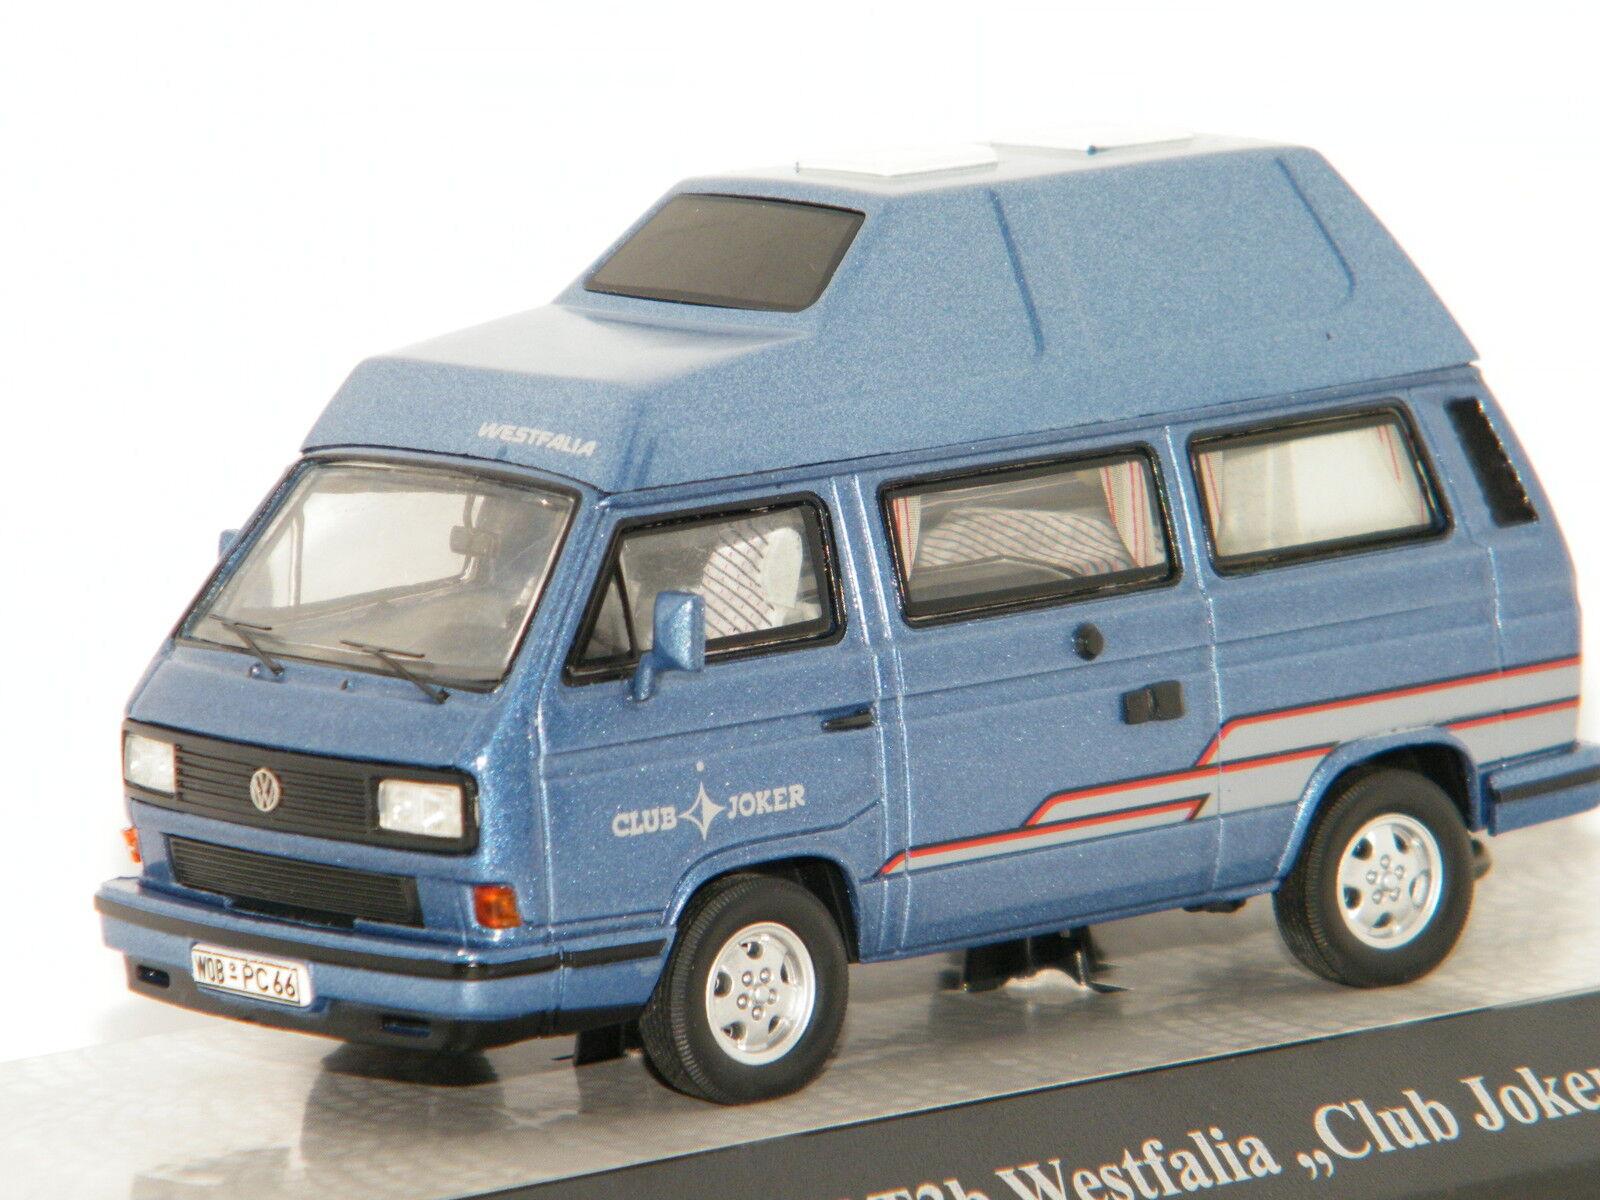 VOLKSWAGEN T3b WESTFALIA  CLUB JOKER  blue METAL PREMIUM CLASIXXS 1 43 Ref 13080